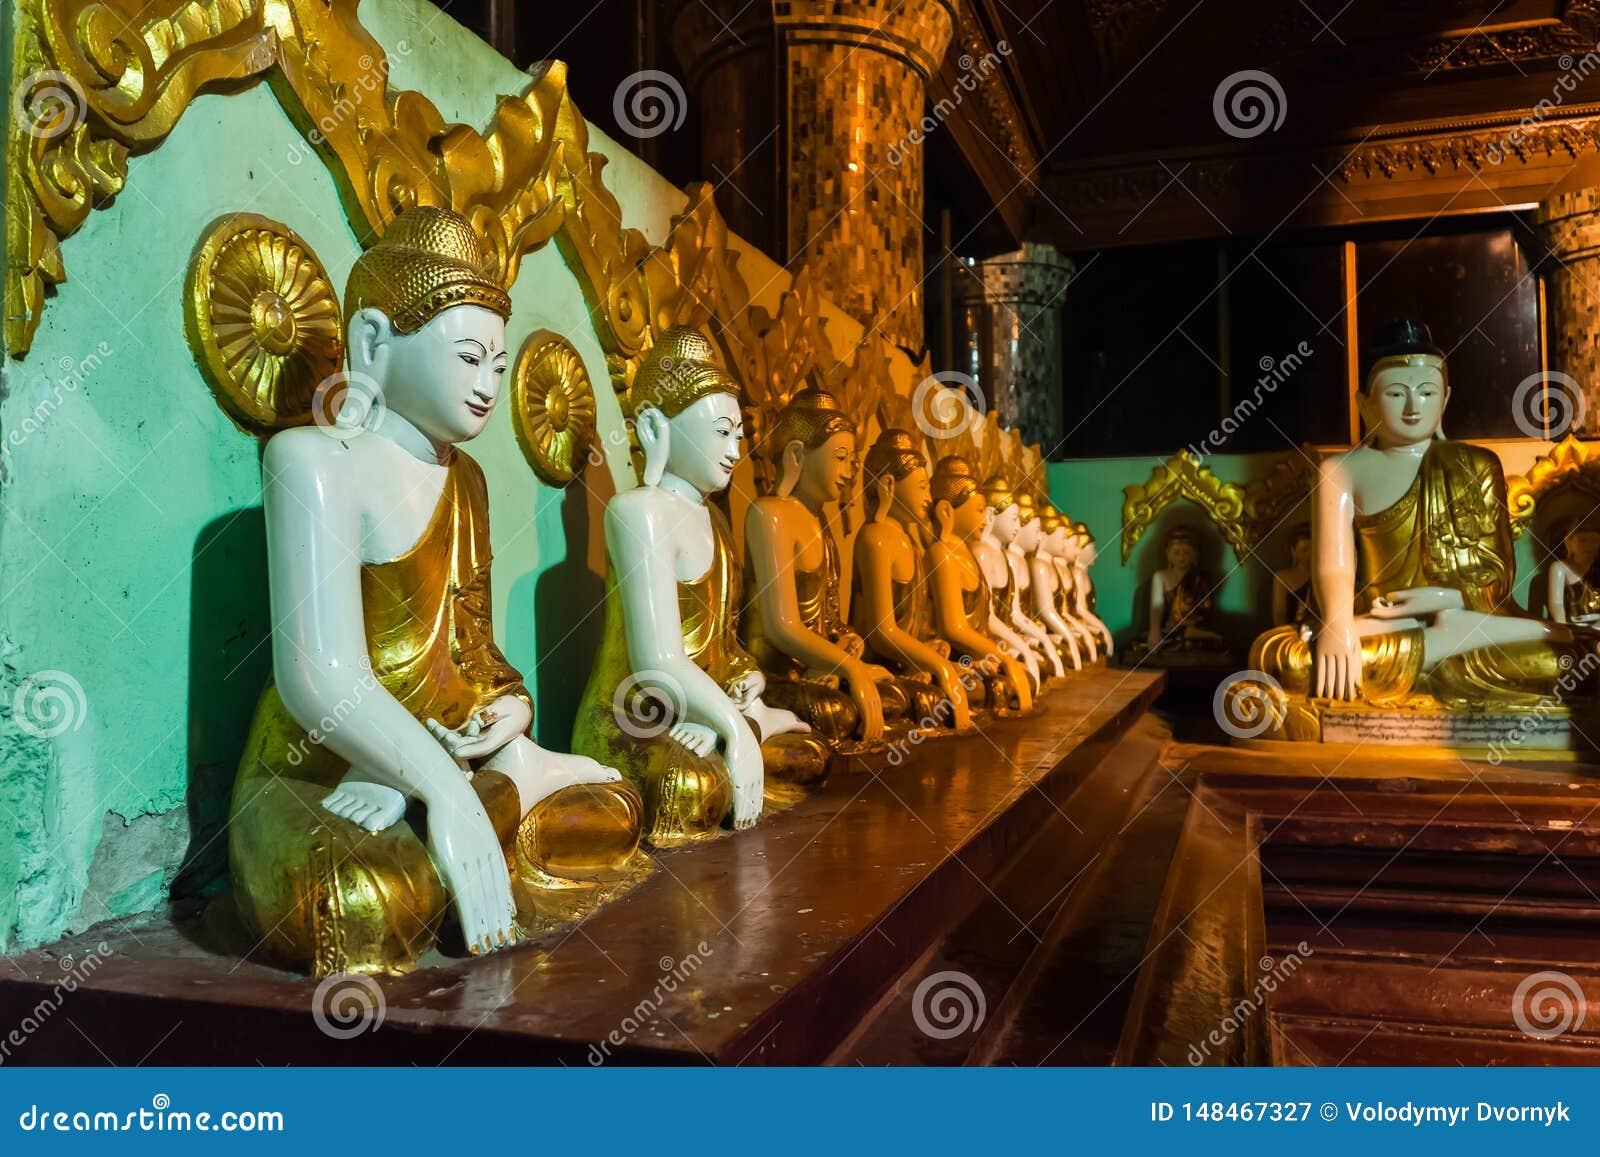 The Seated Buddha Statues In The Shwedagon Pagoda, Yangon, Myanmar